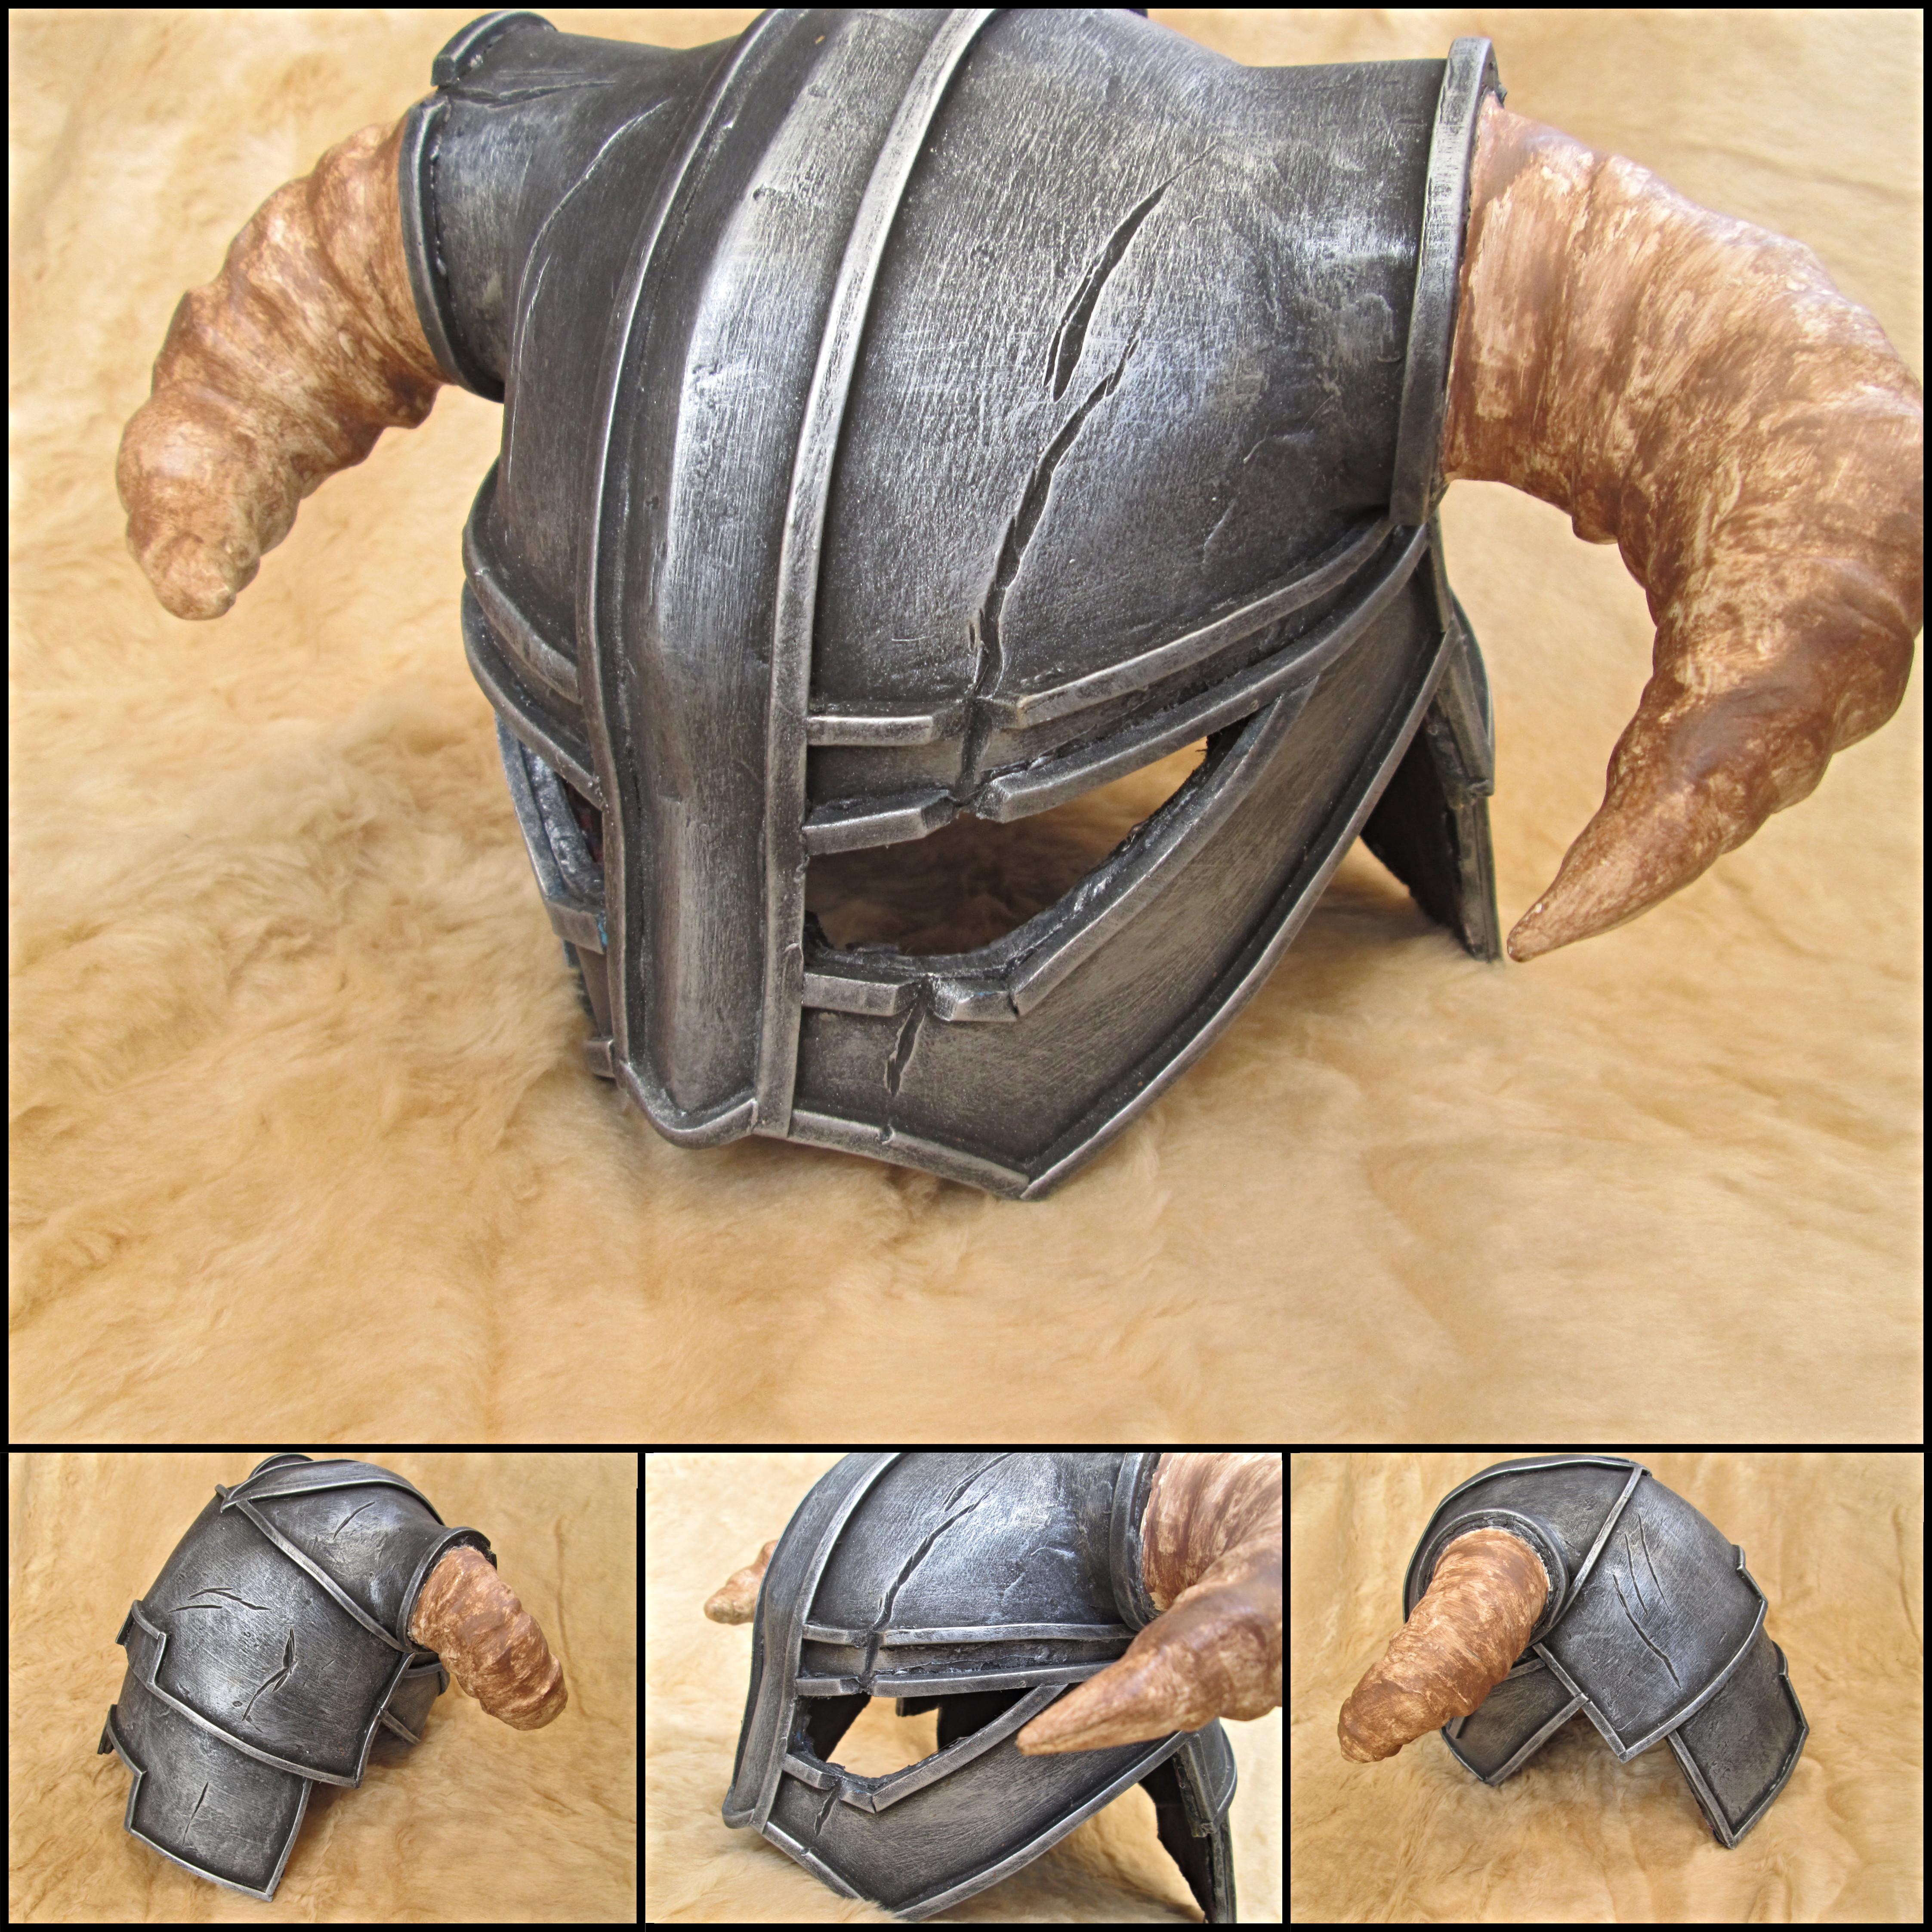 Skyrim Iron Helmet by JosuaArtDesigns on DeviantArt